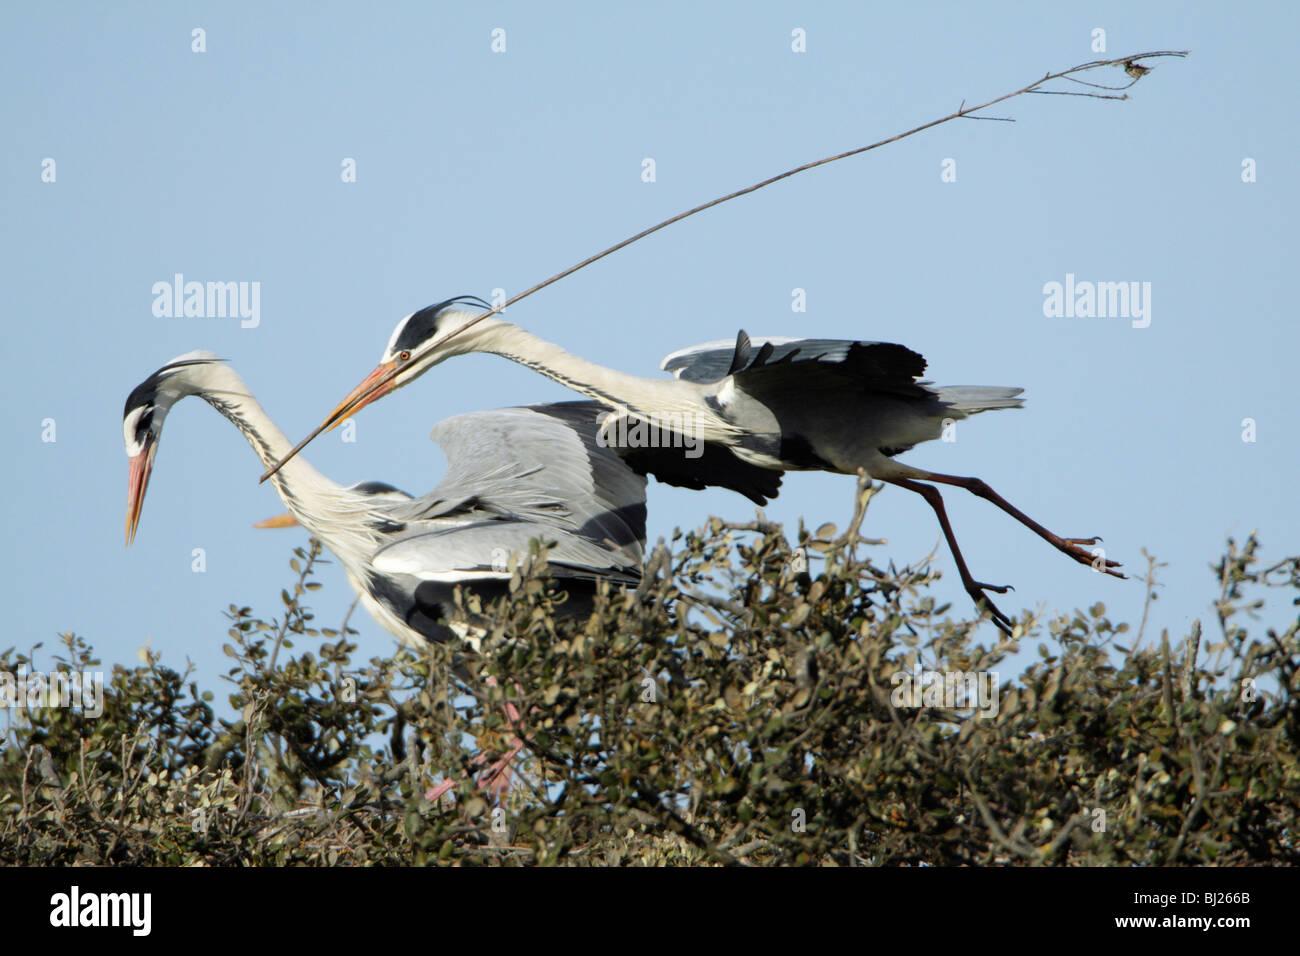 Garza real (Ardea cinerea), en vuelo aterrizaba en nido con material de nido, Portugal Imagen De Stock